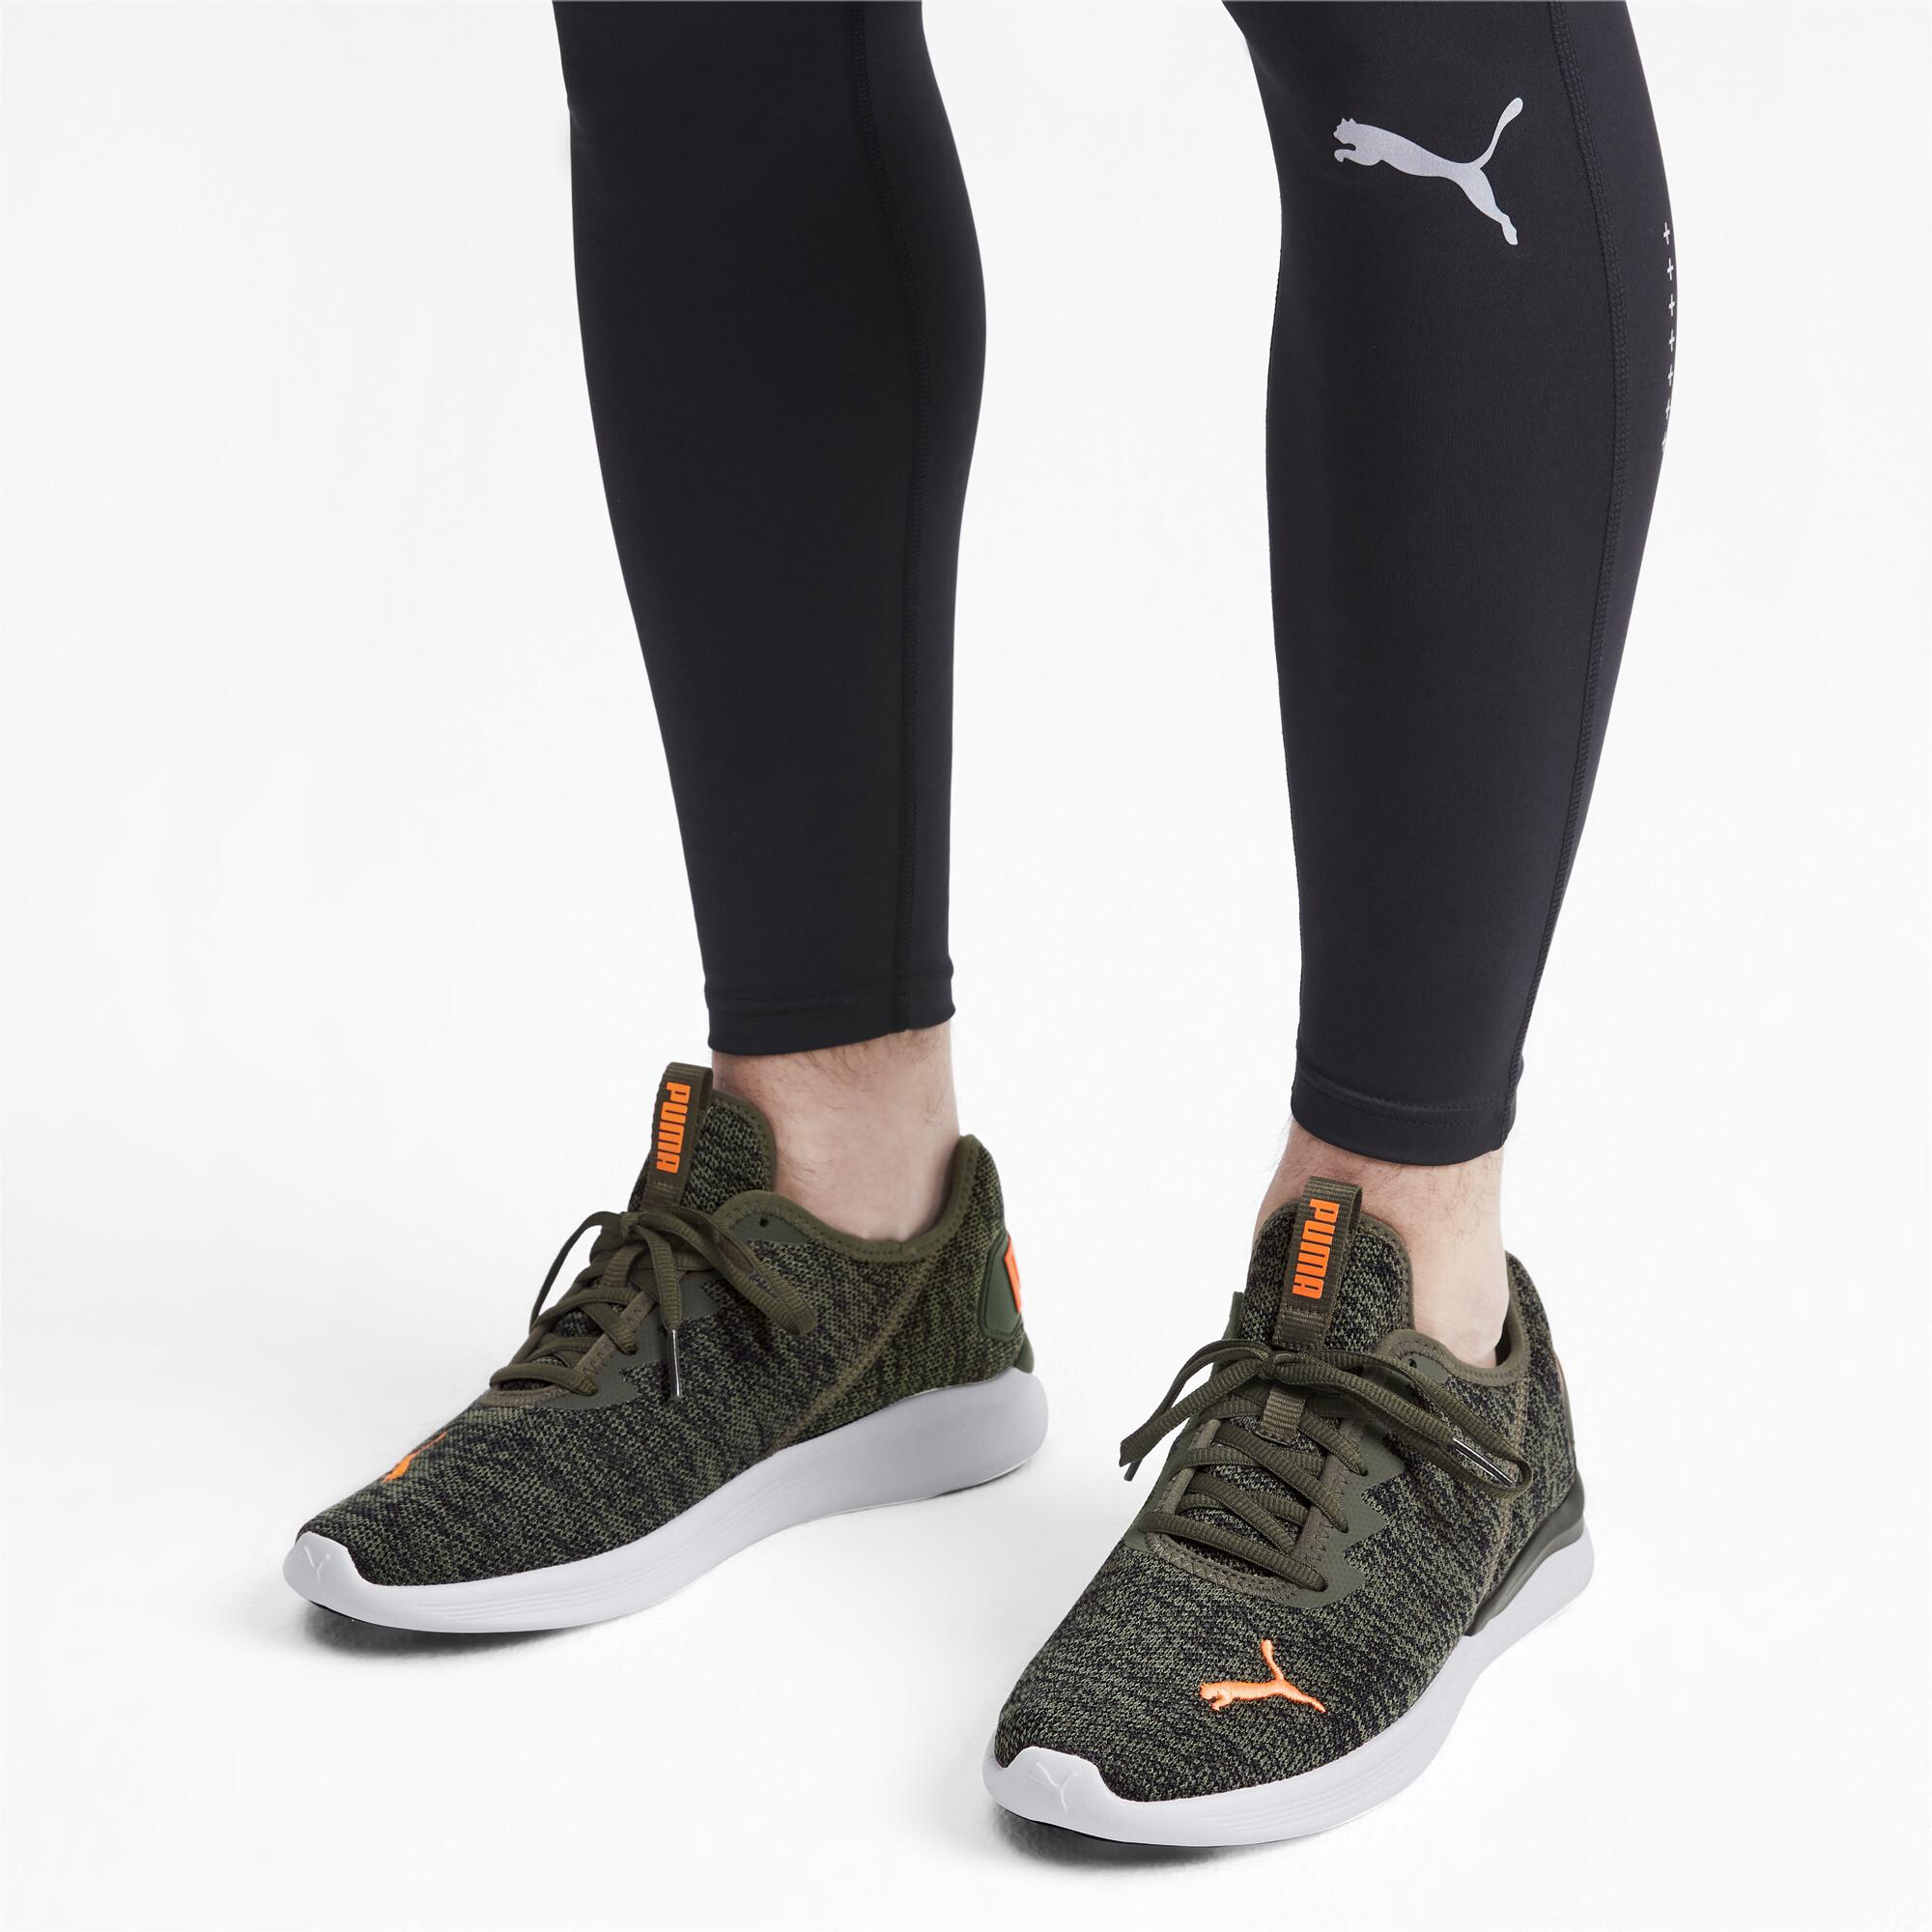 PUMA-Ballast-Men-039-s-Running-Shoes-Men-Shoe-Running thumbnail 5